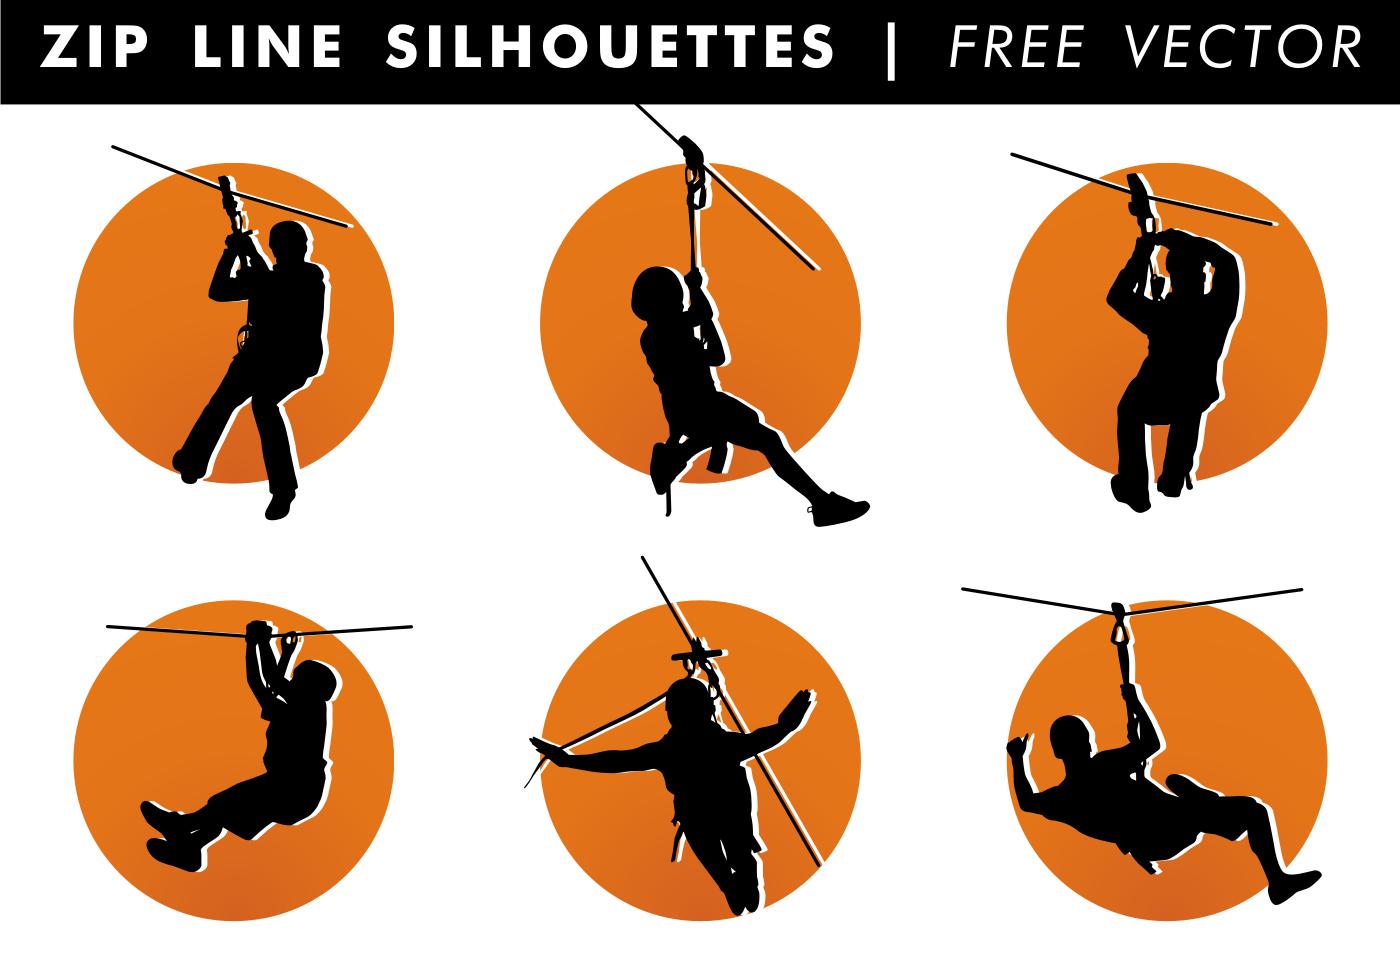 D Line Drawings Zip : Zip line silhouettes vector download free art